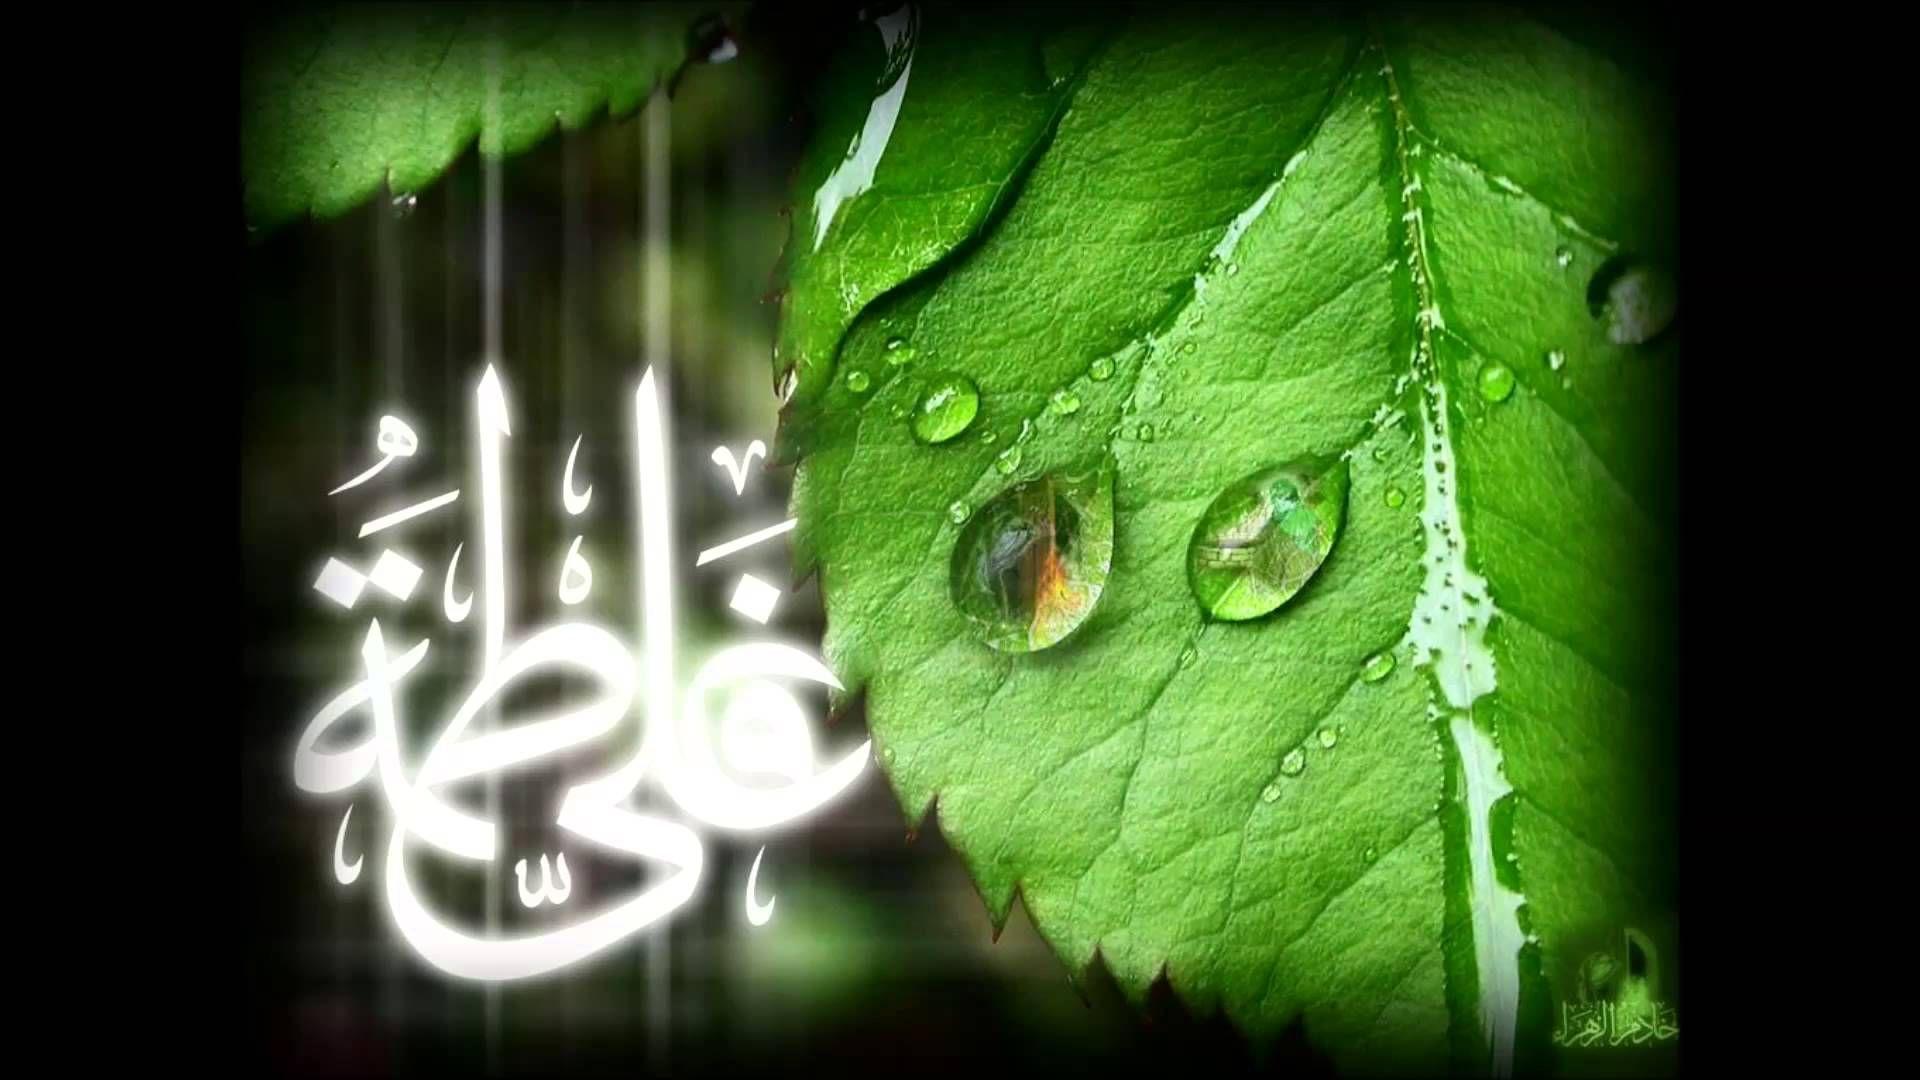 Dua Kumail دعاء كميل بصوت الشيخ باقر المقدسي Plant Leaves Plants Imam Ali